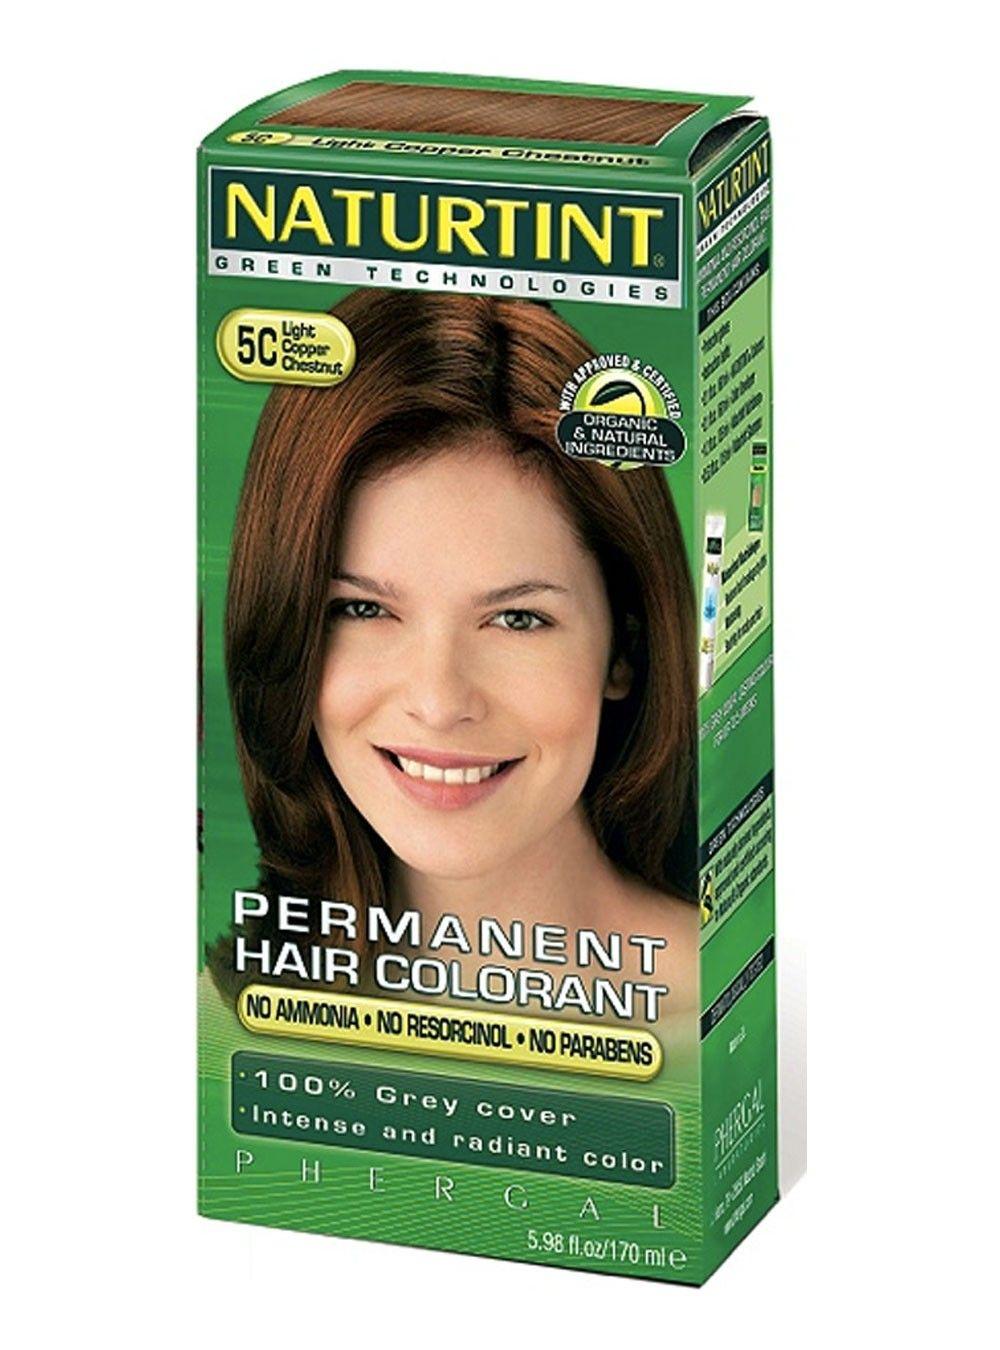 Wikaniko Organic Natural And Eco Friendly Products Naturtint